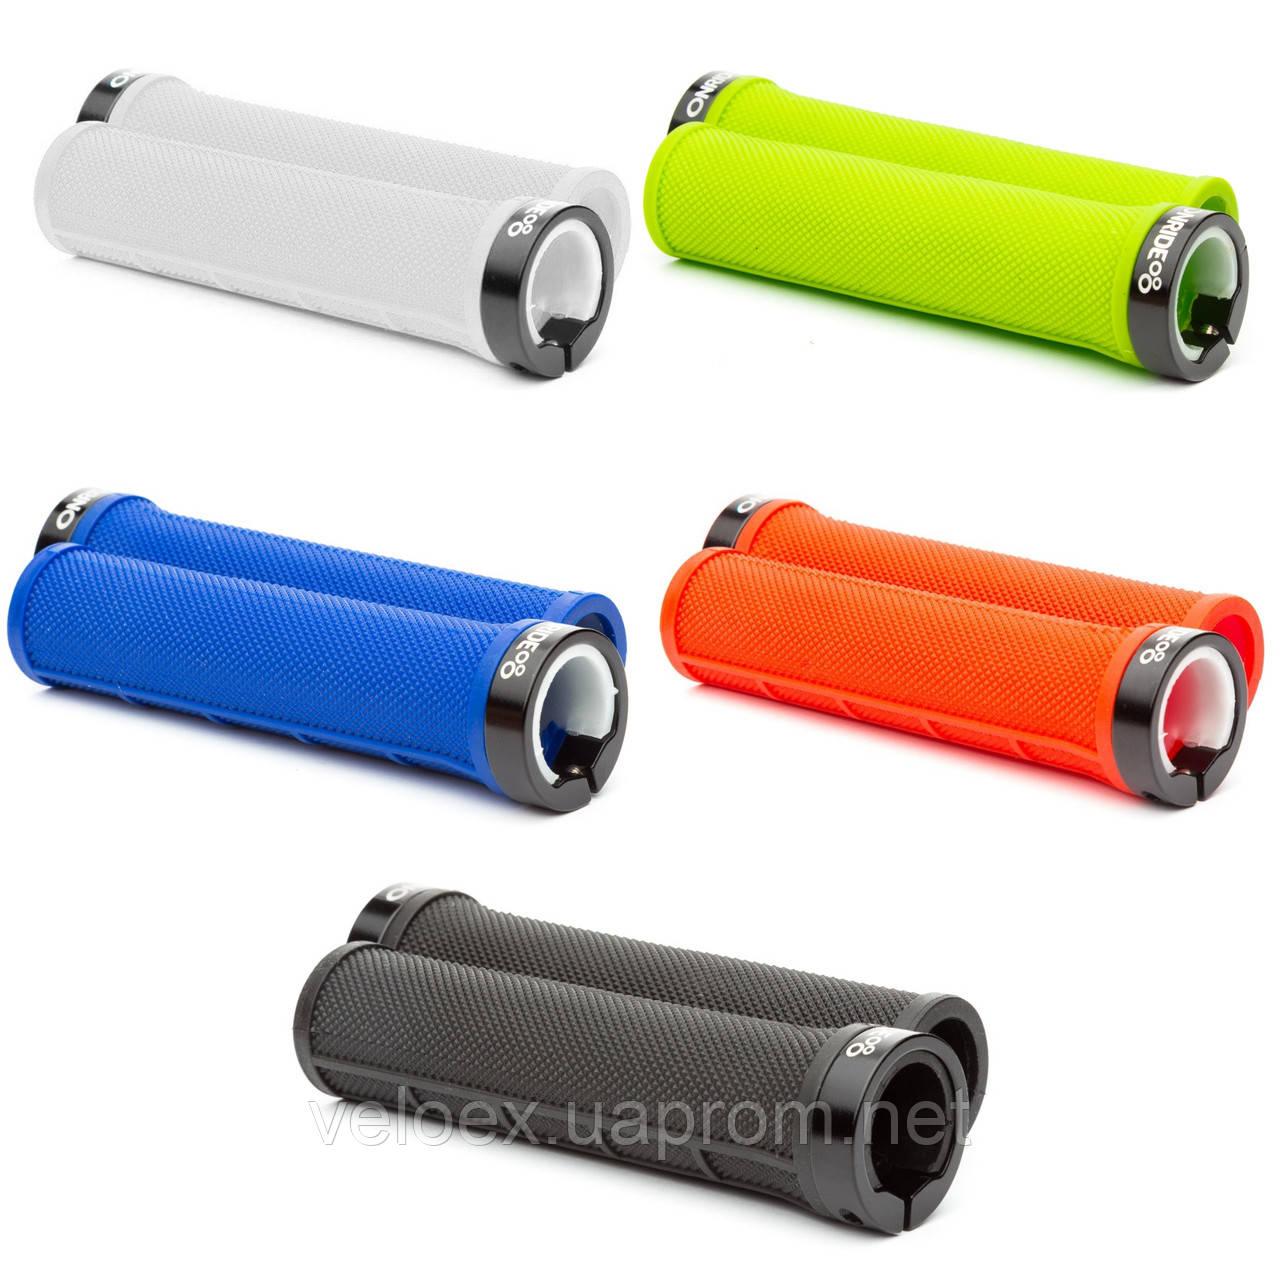 Ручки руля ONRIDE GripOne цвета